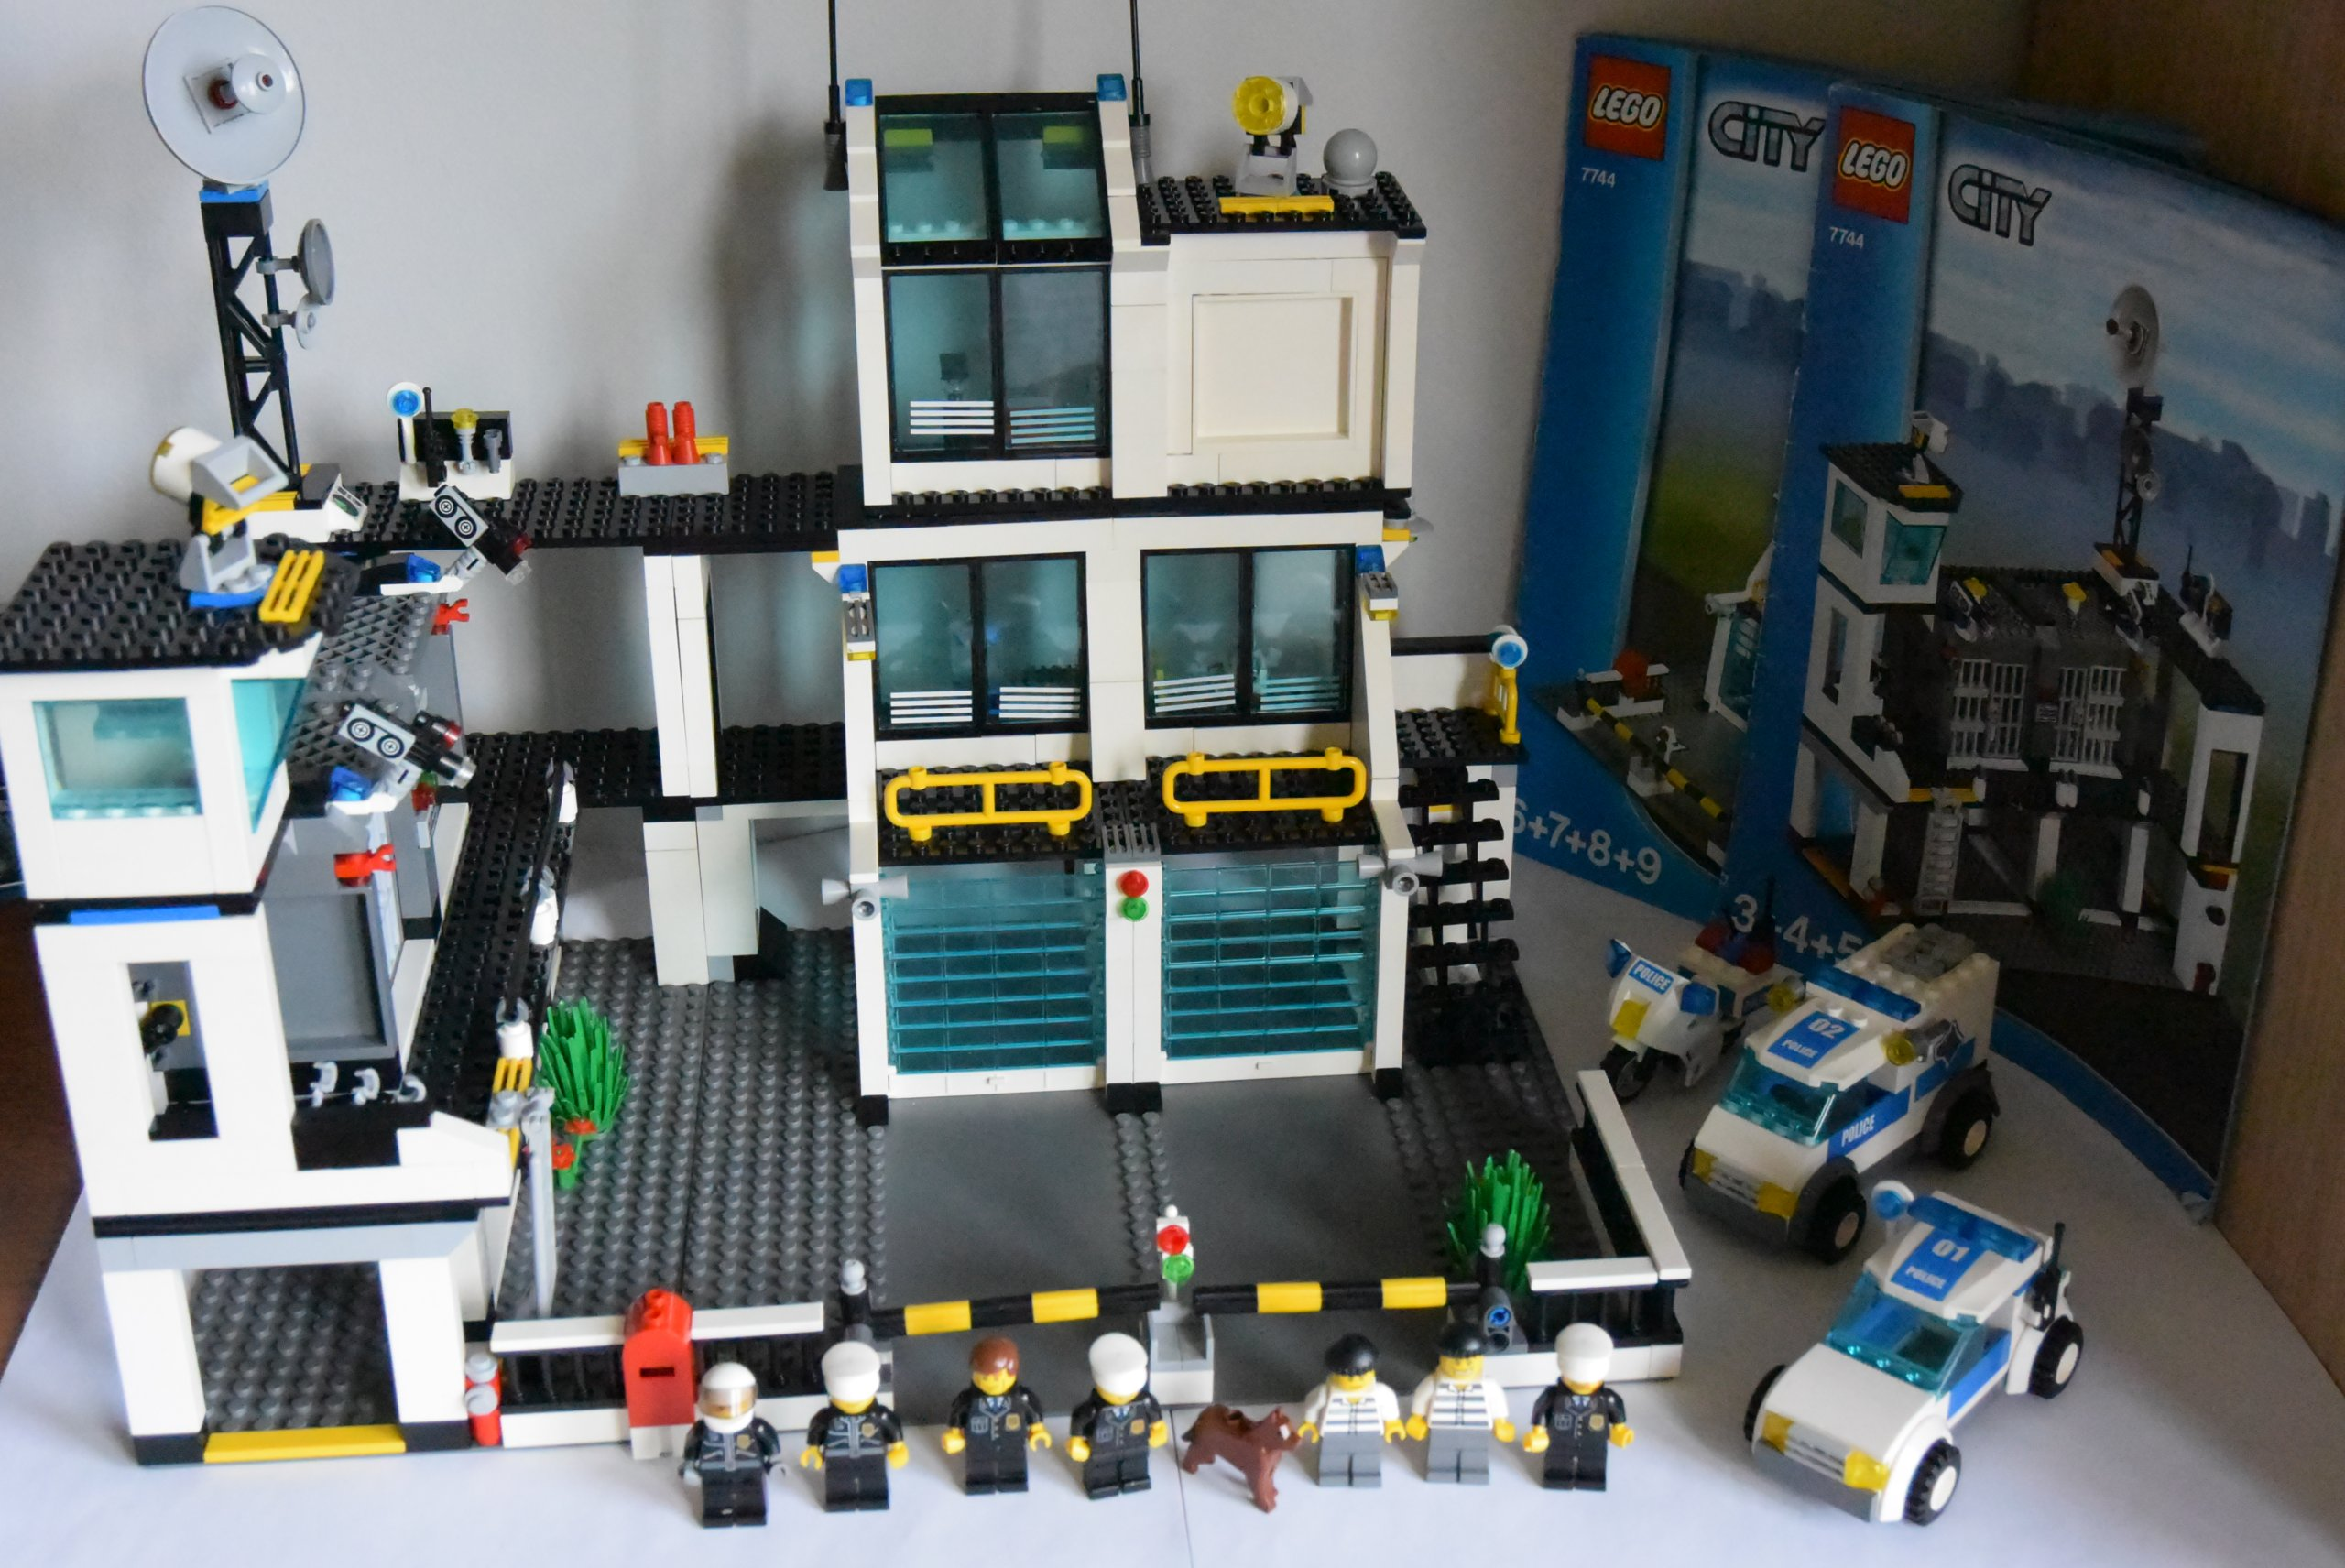 Klocki Lego City 7744 Posterunek Policji 7346667240 Oficjalne